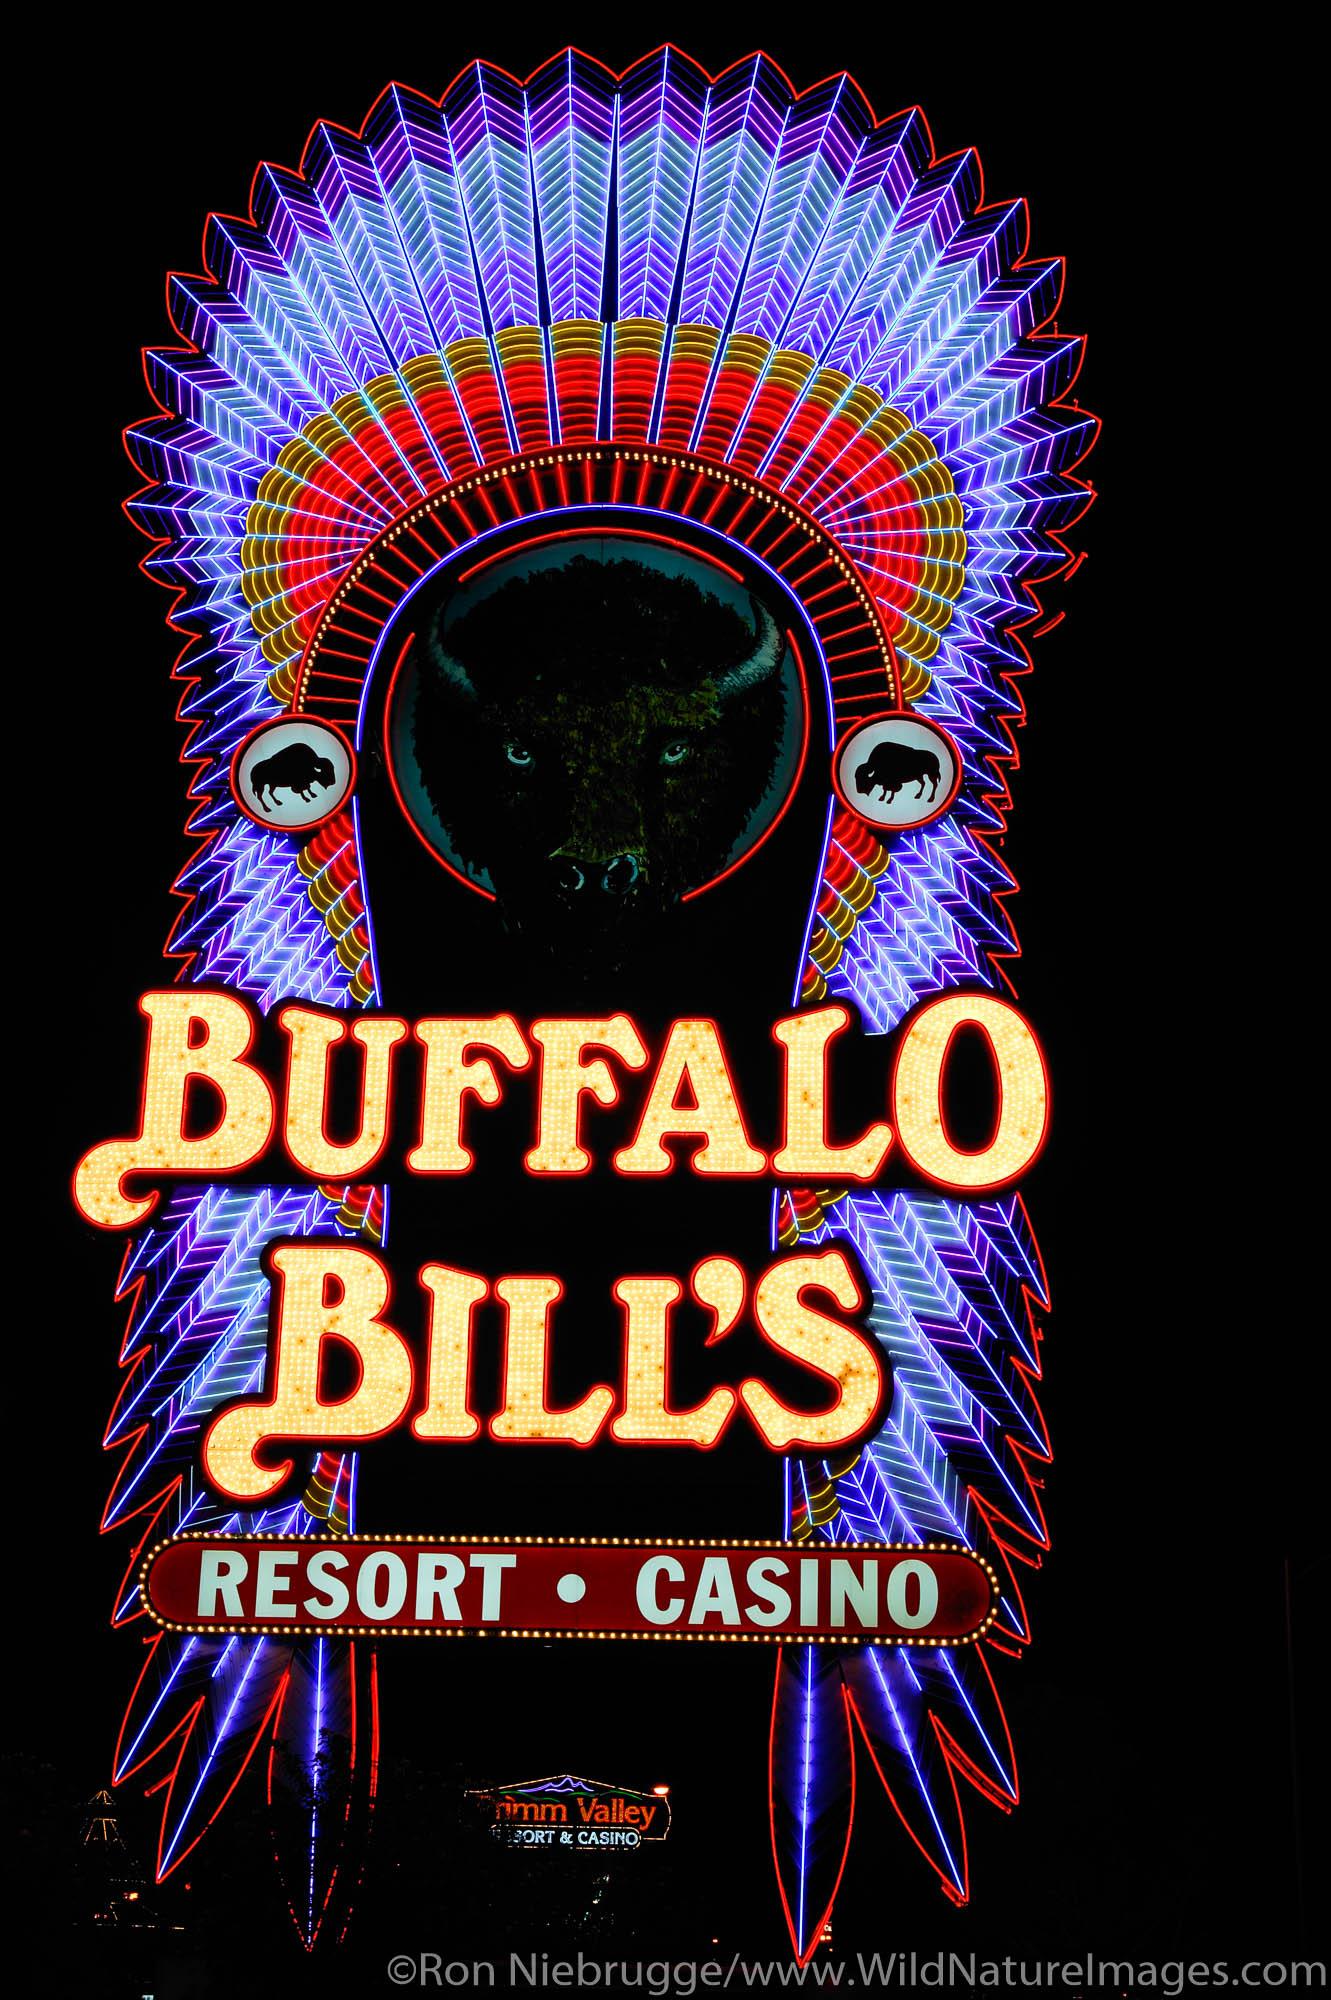 Buffalo Bill's Nevada / California state line, Nevada.